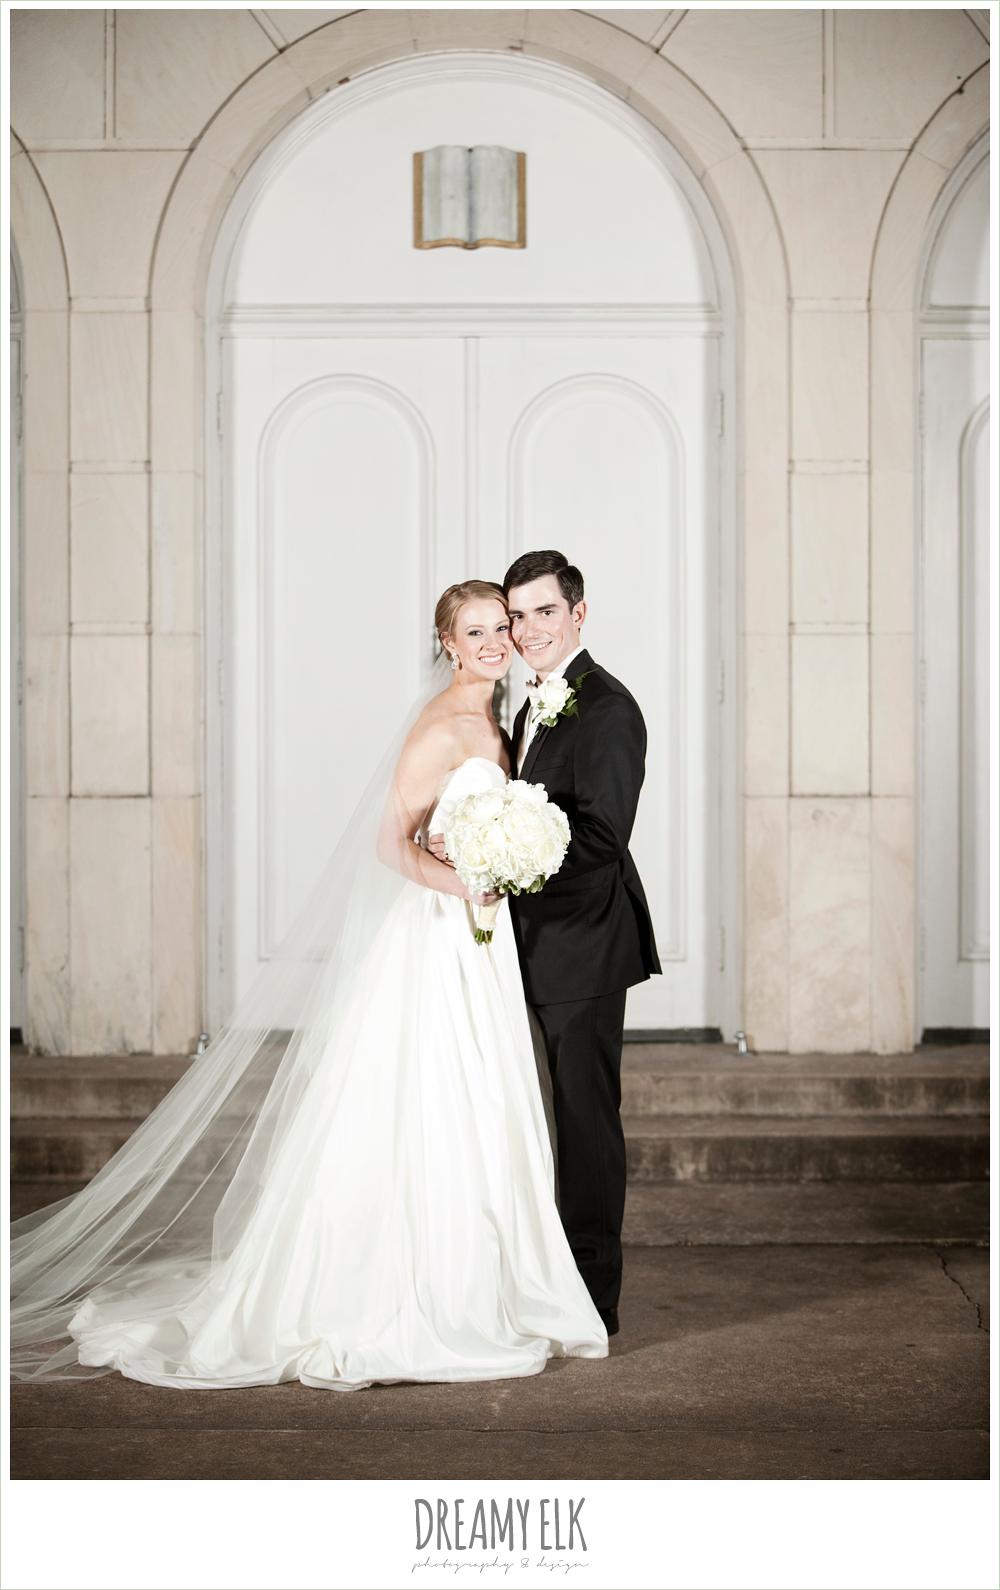 bride and groom, sweetheart strapless wedding dress, winter wedding, austin wedding photographer, dreamy elk photography and design